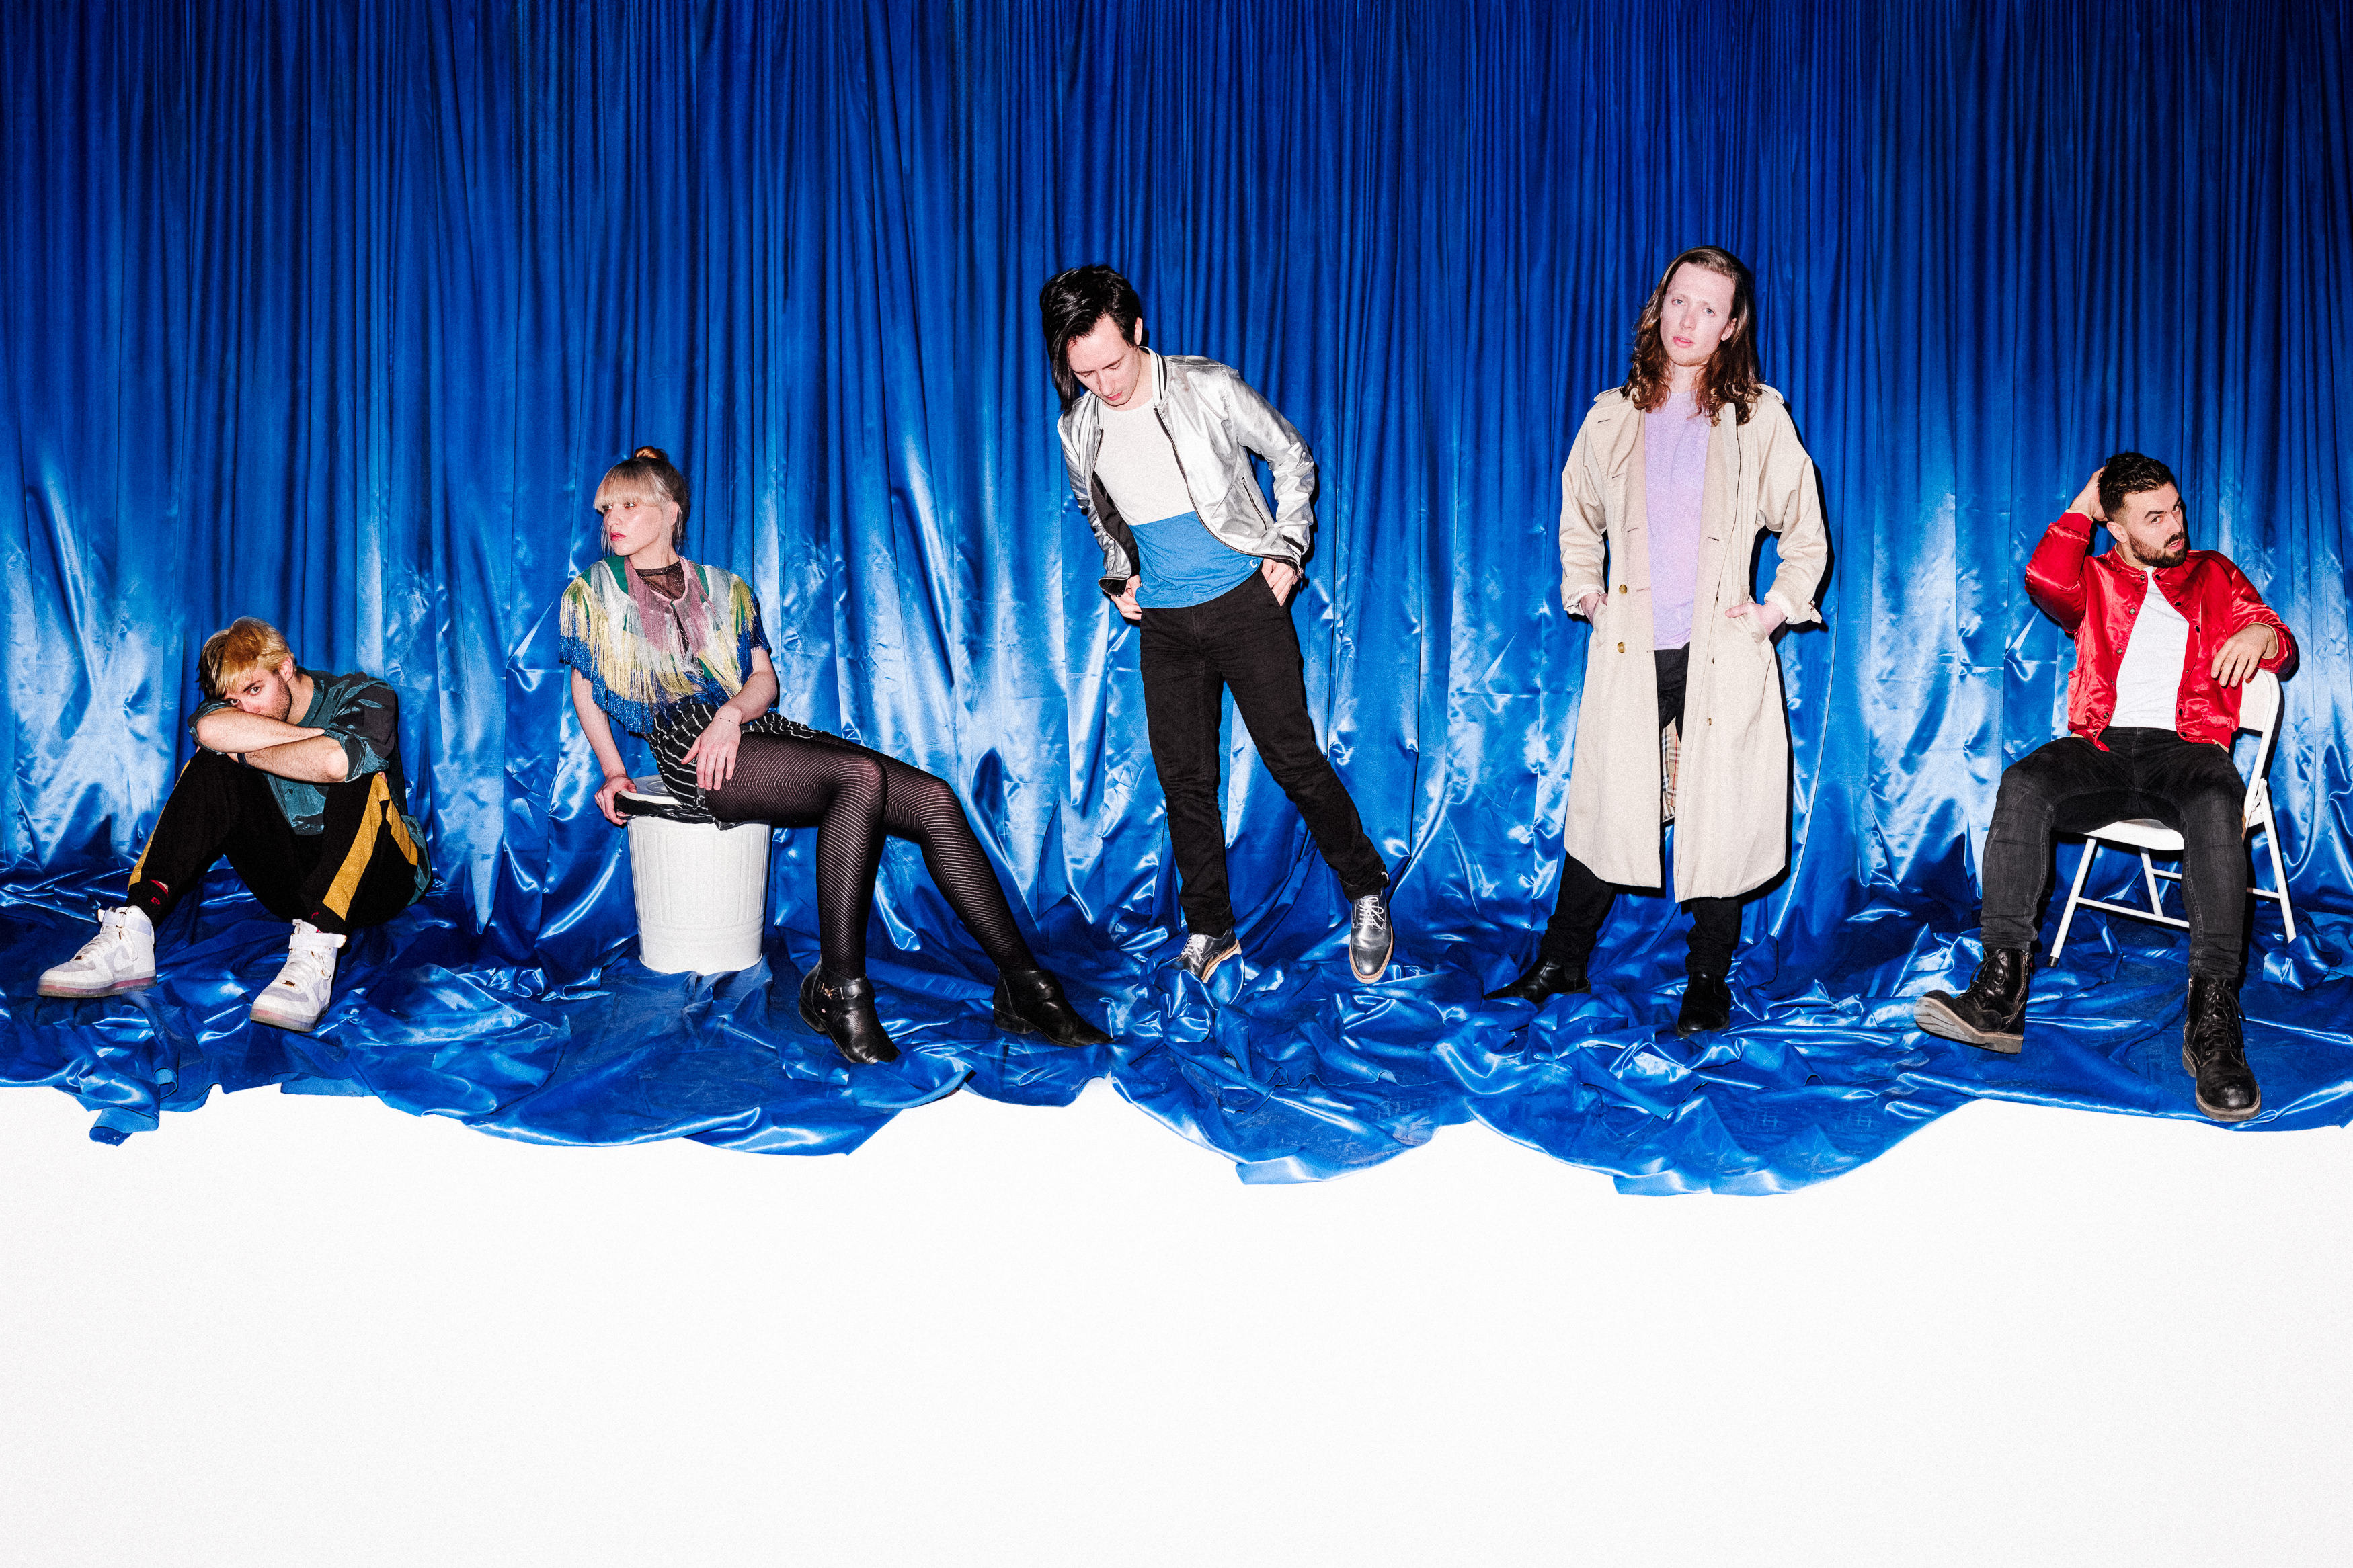 White at Scottish Alternative Music Awards - Love Music; Love Life